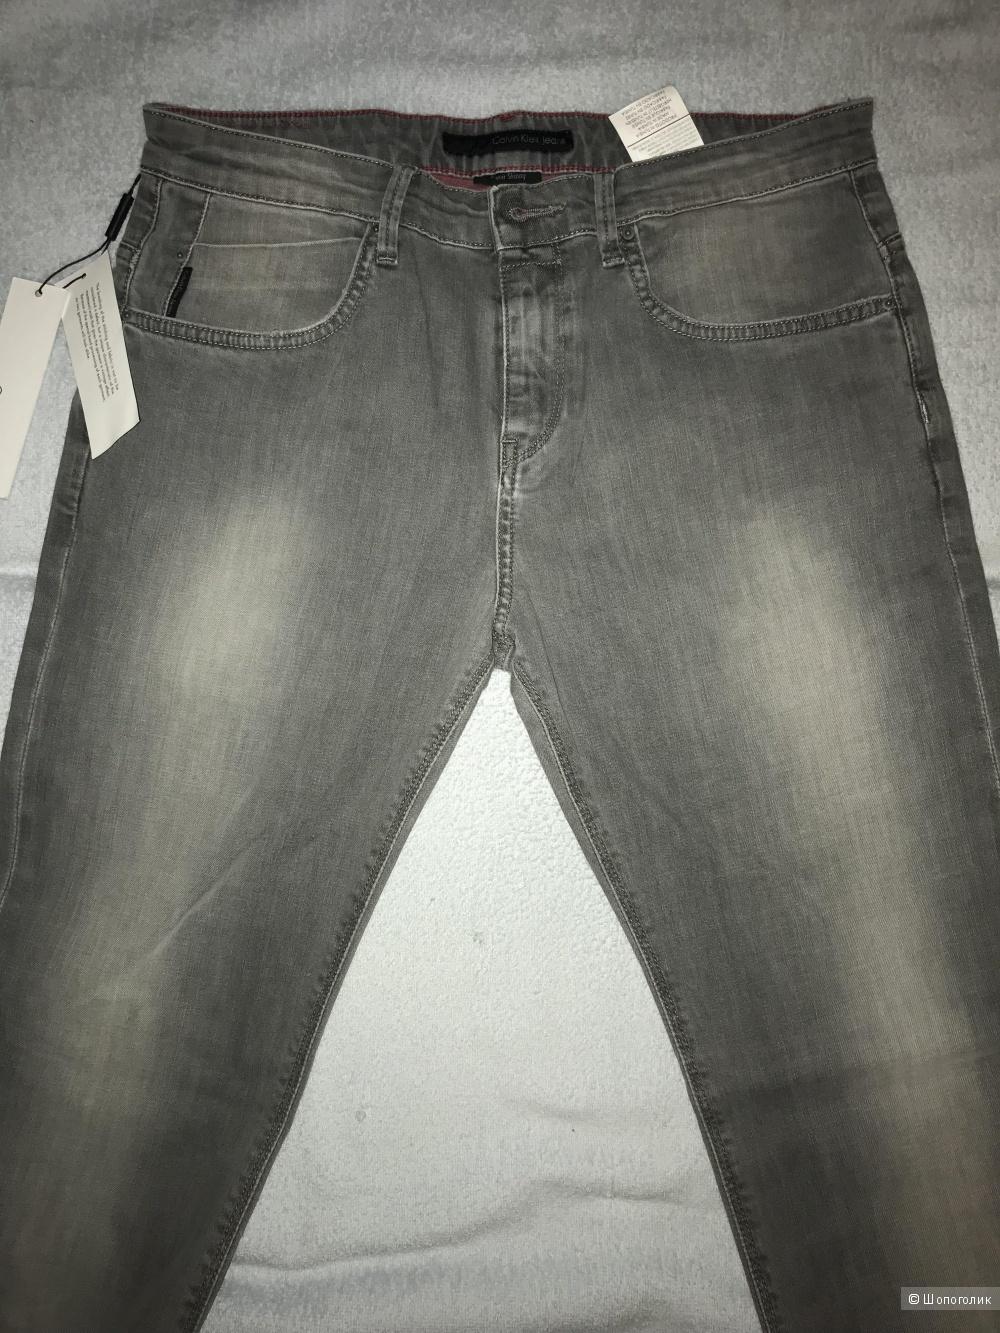 Мужские джинсы Calvin Klein. размер W 32 L 34